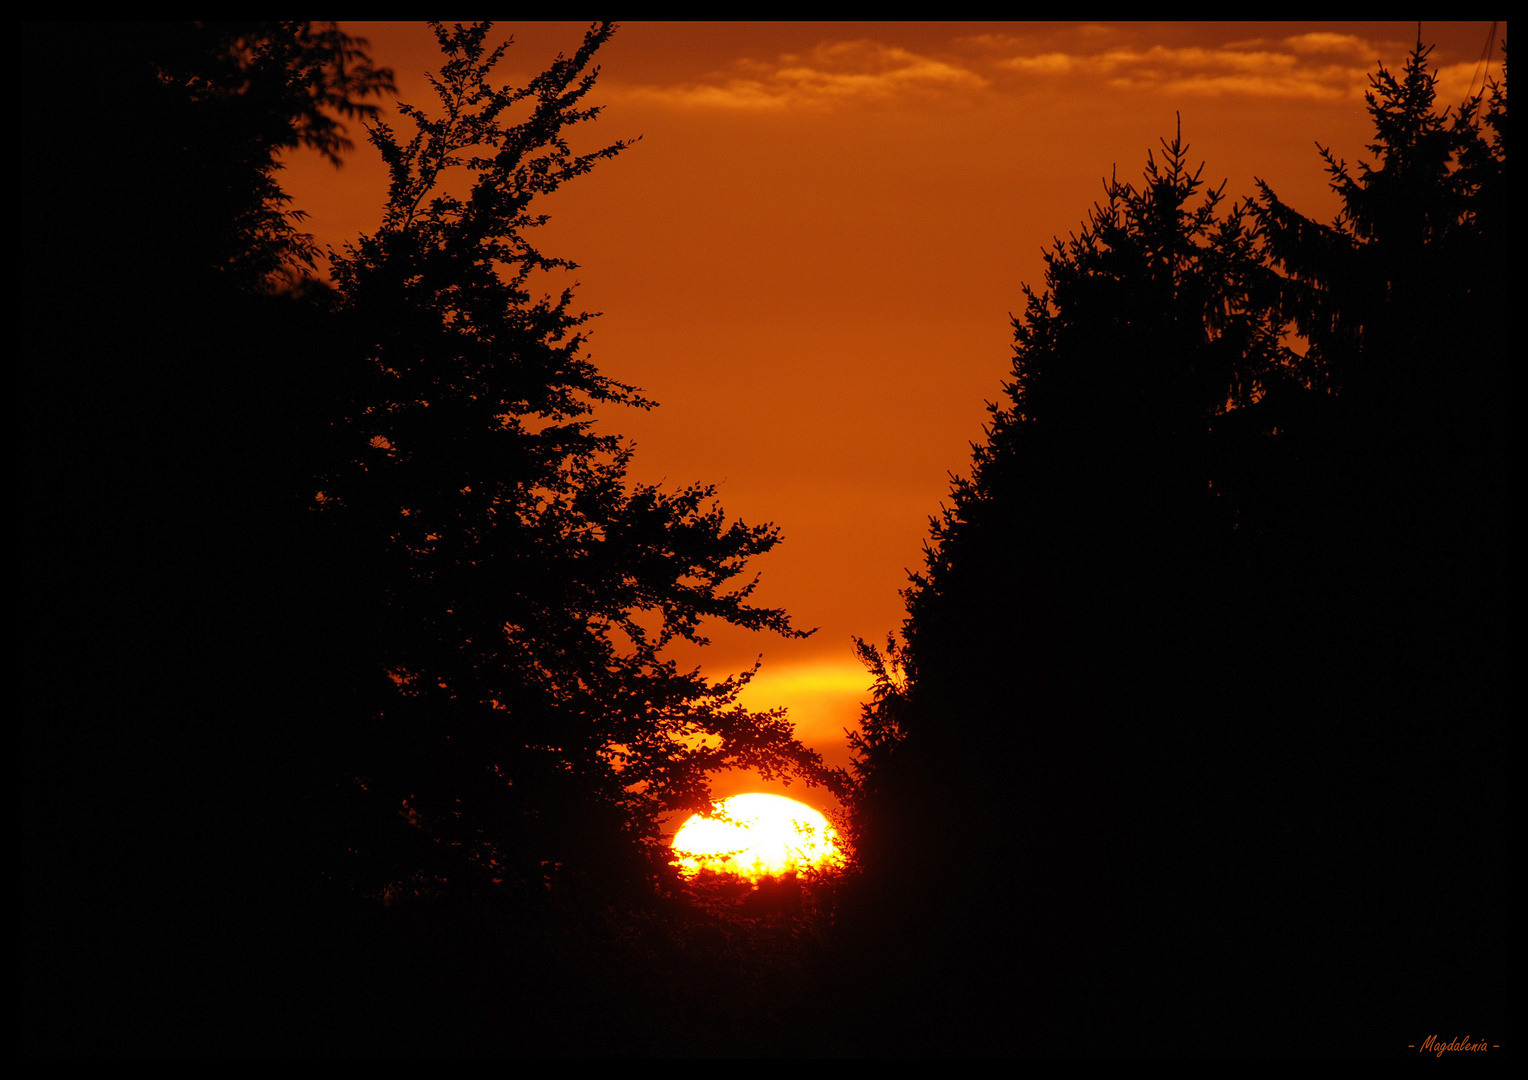 El sol, mi amor